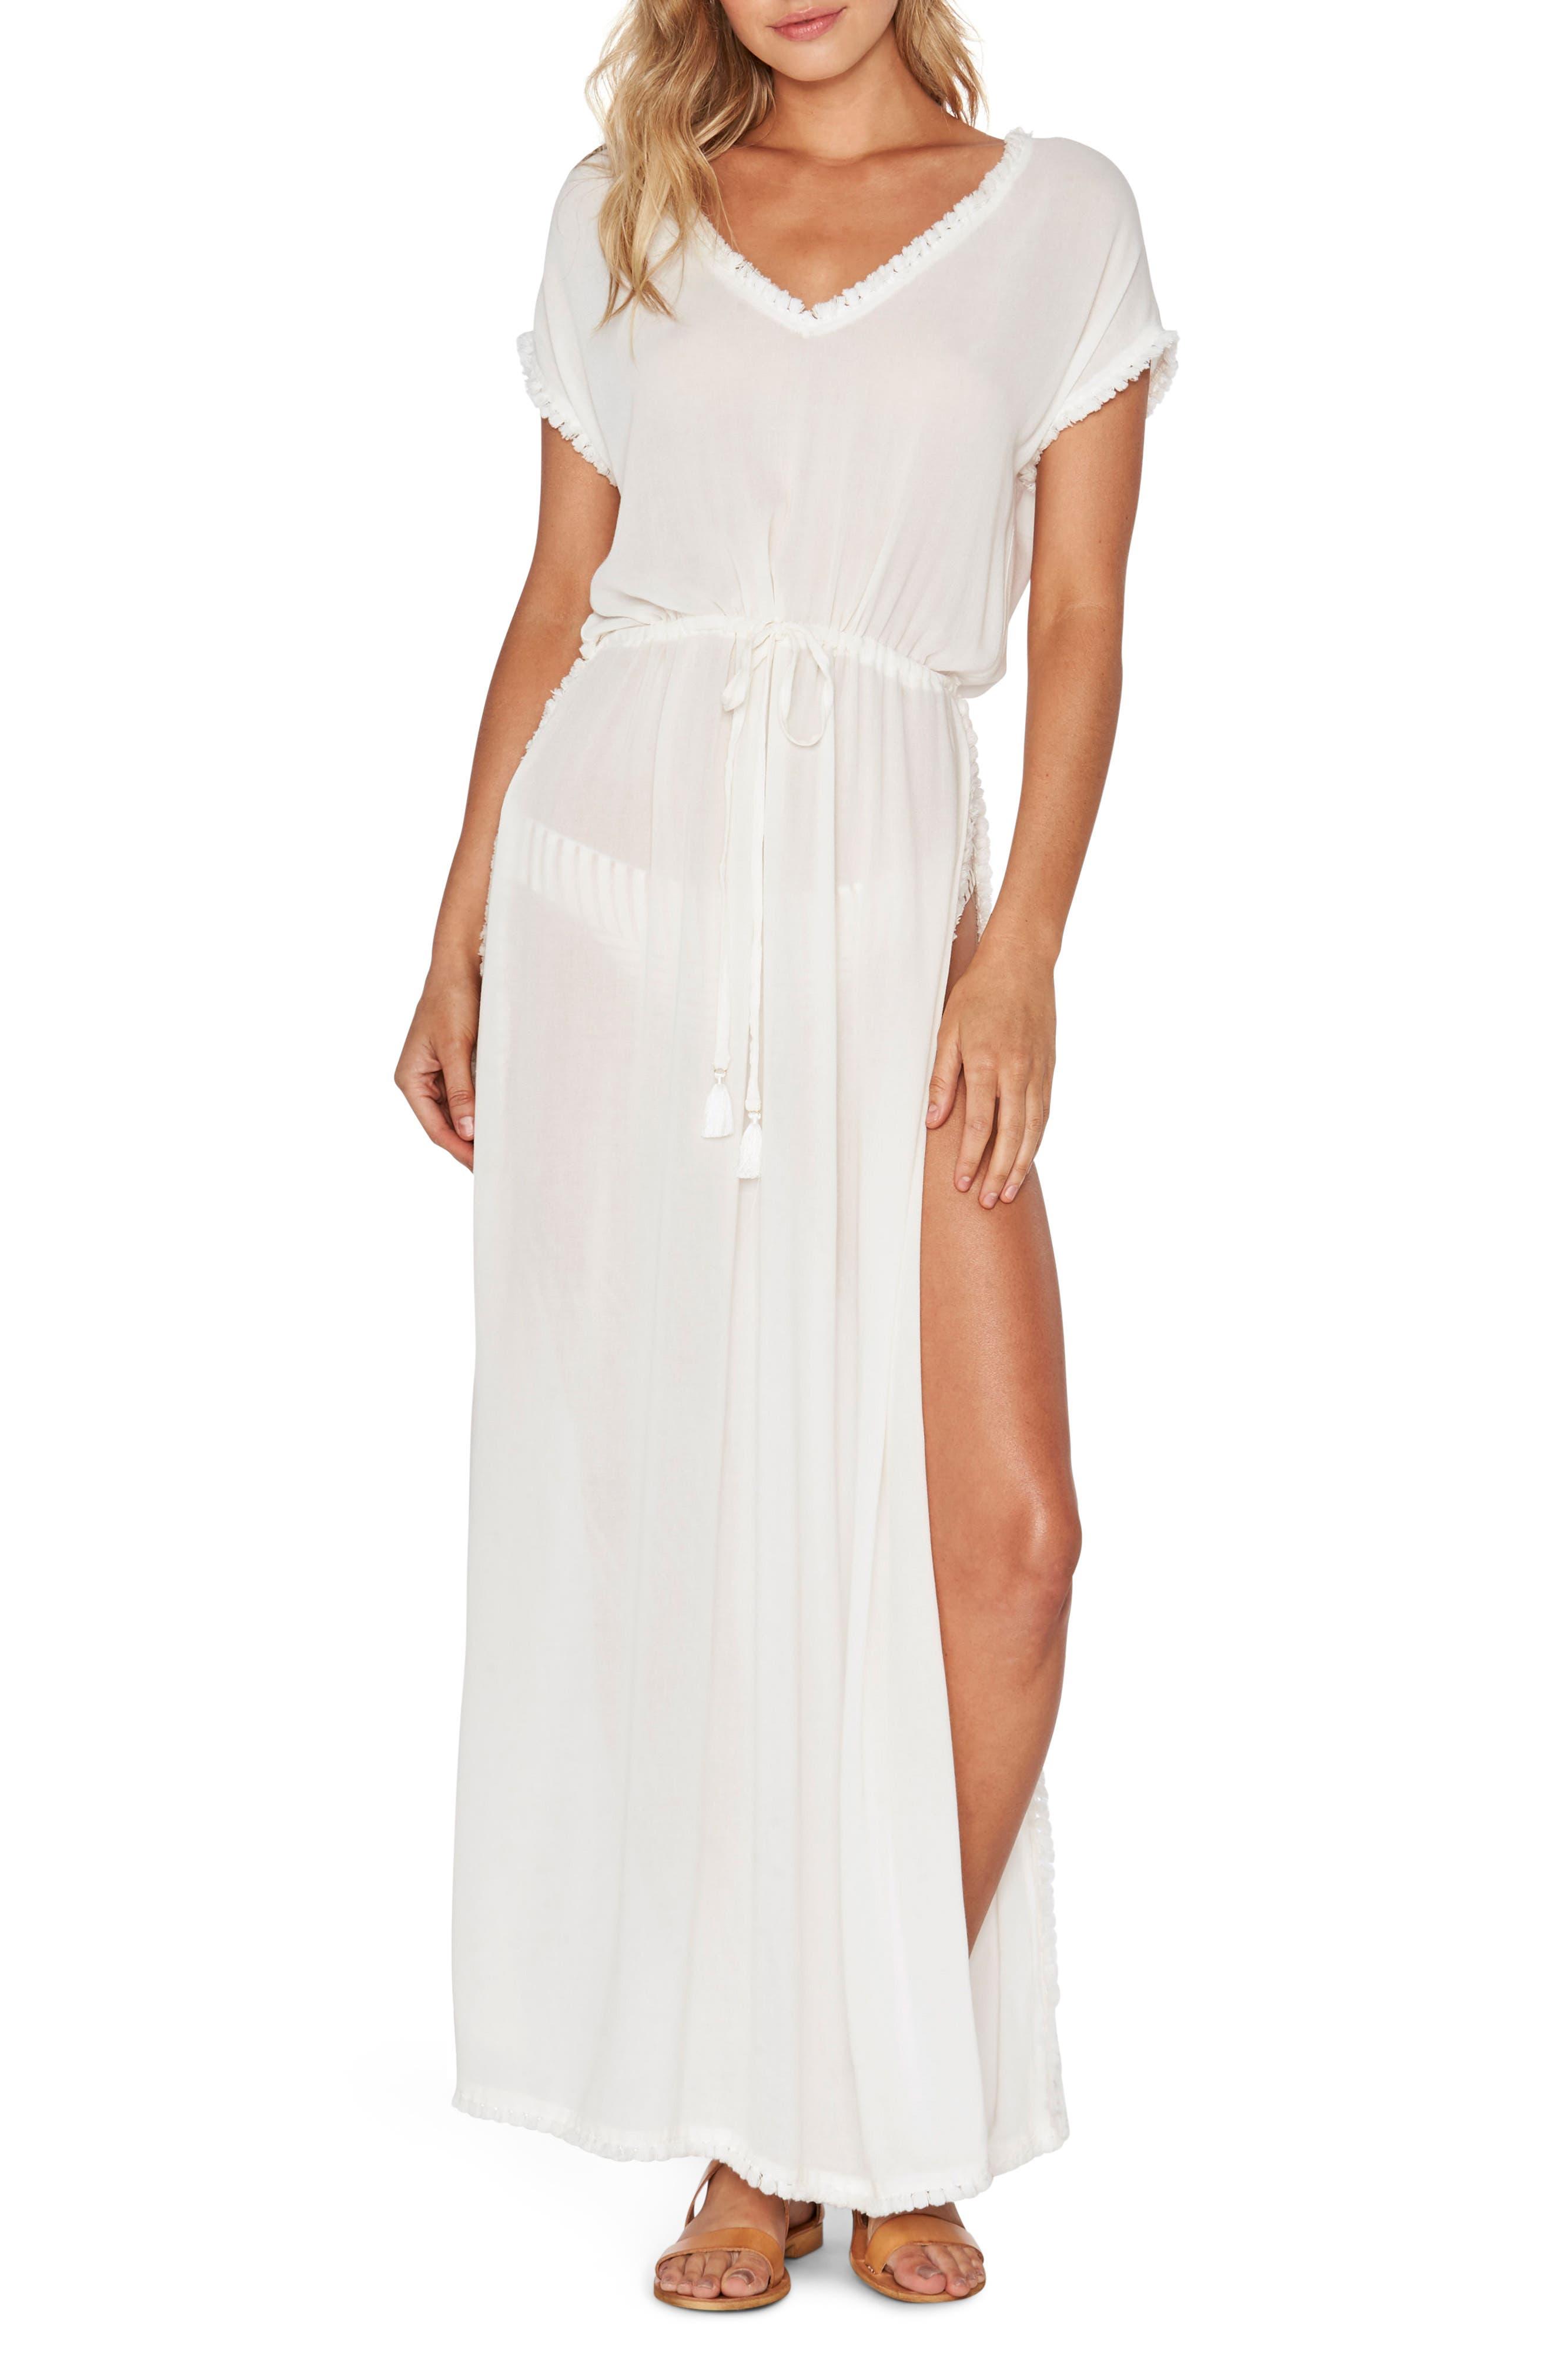 Noveau Cover-Up Maxi Dress,                         Main,                         color, White